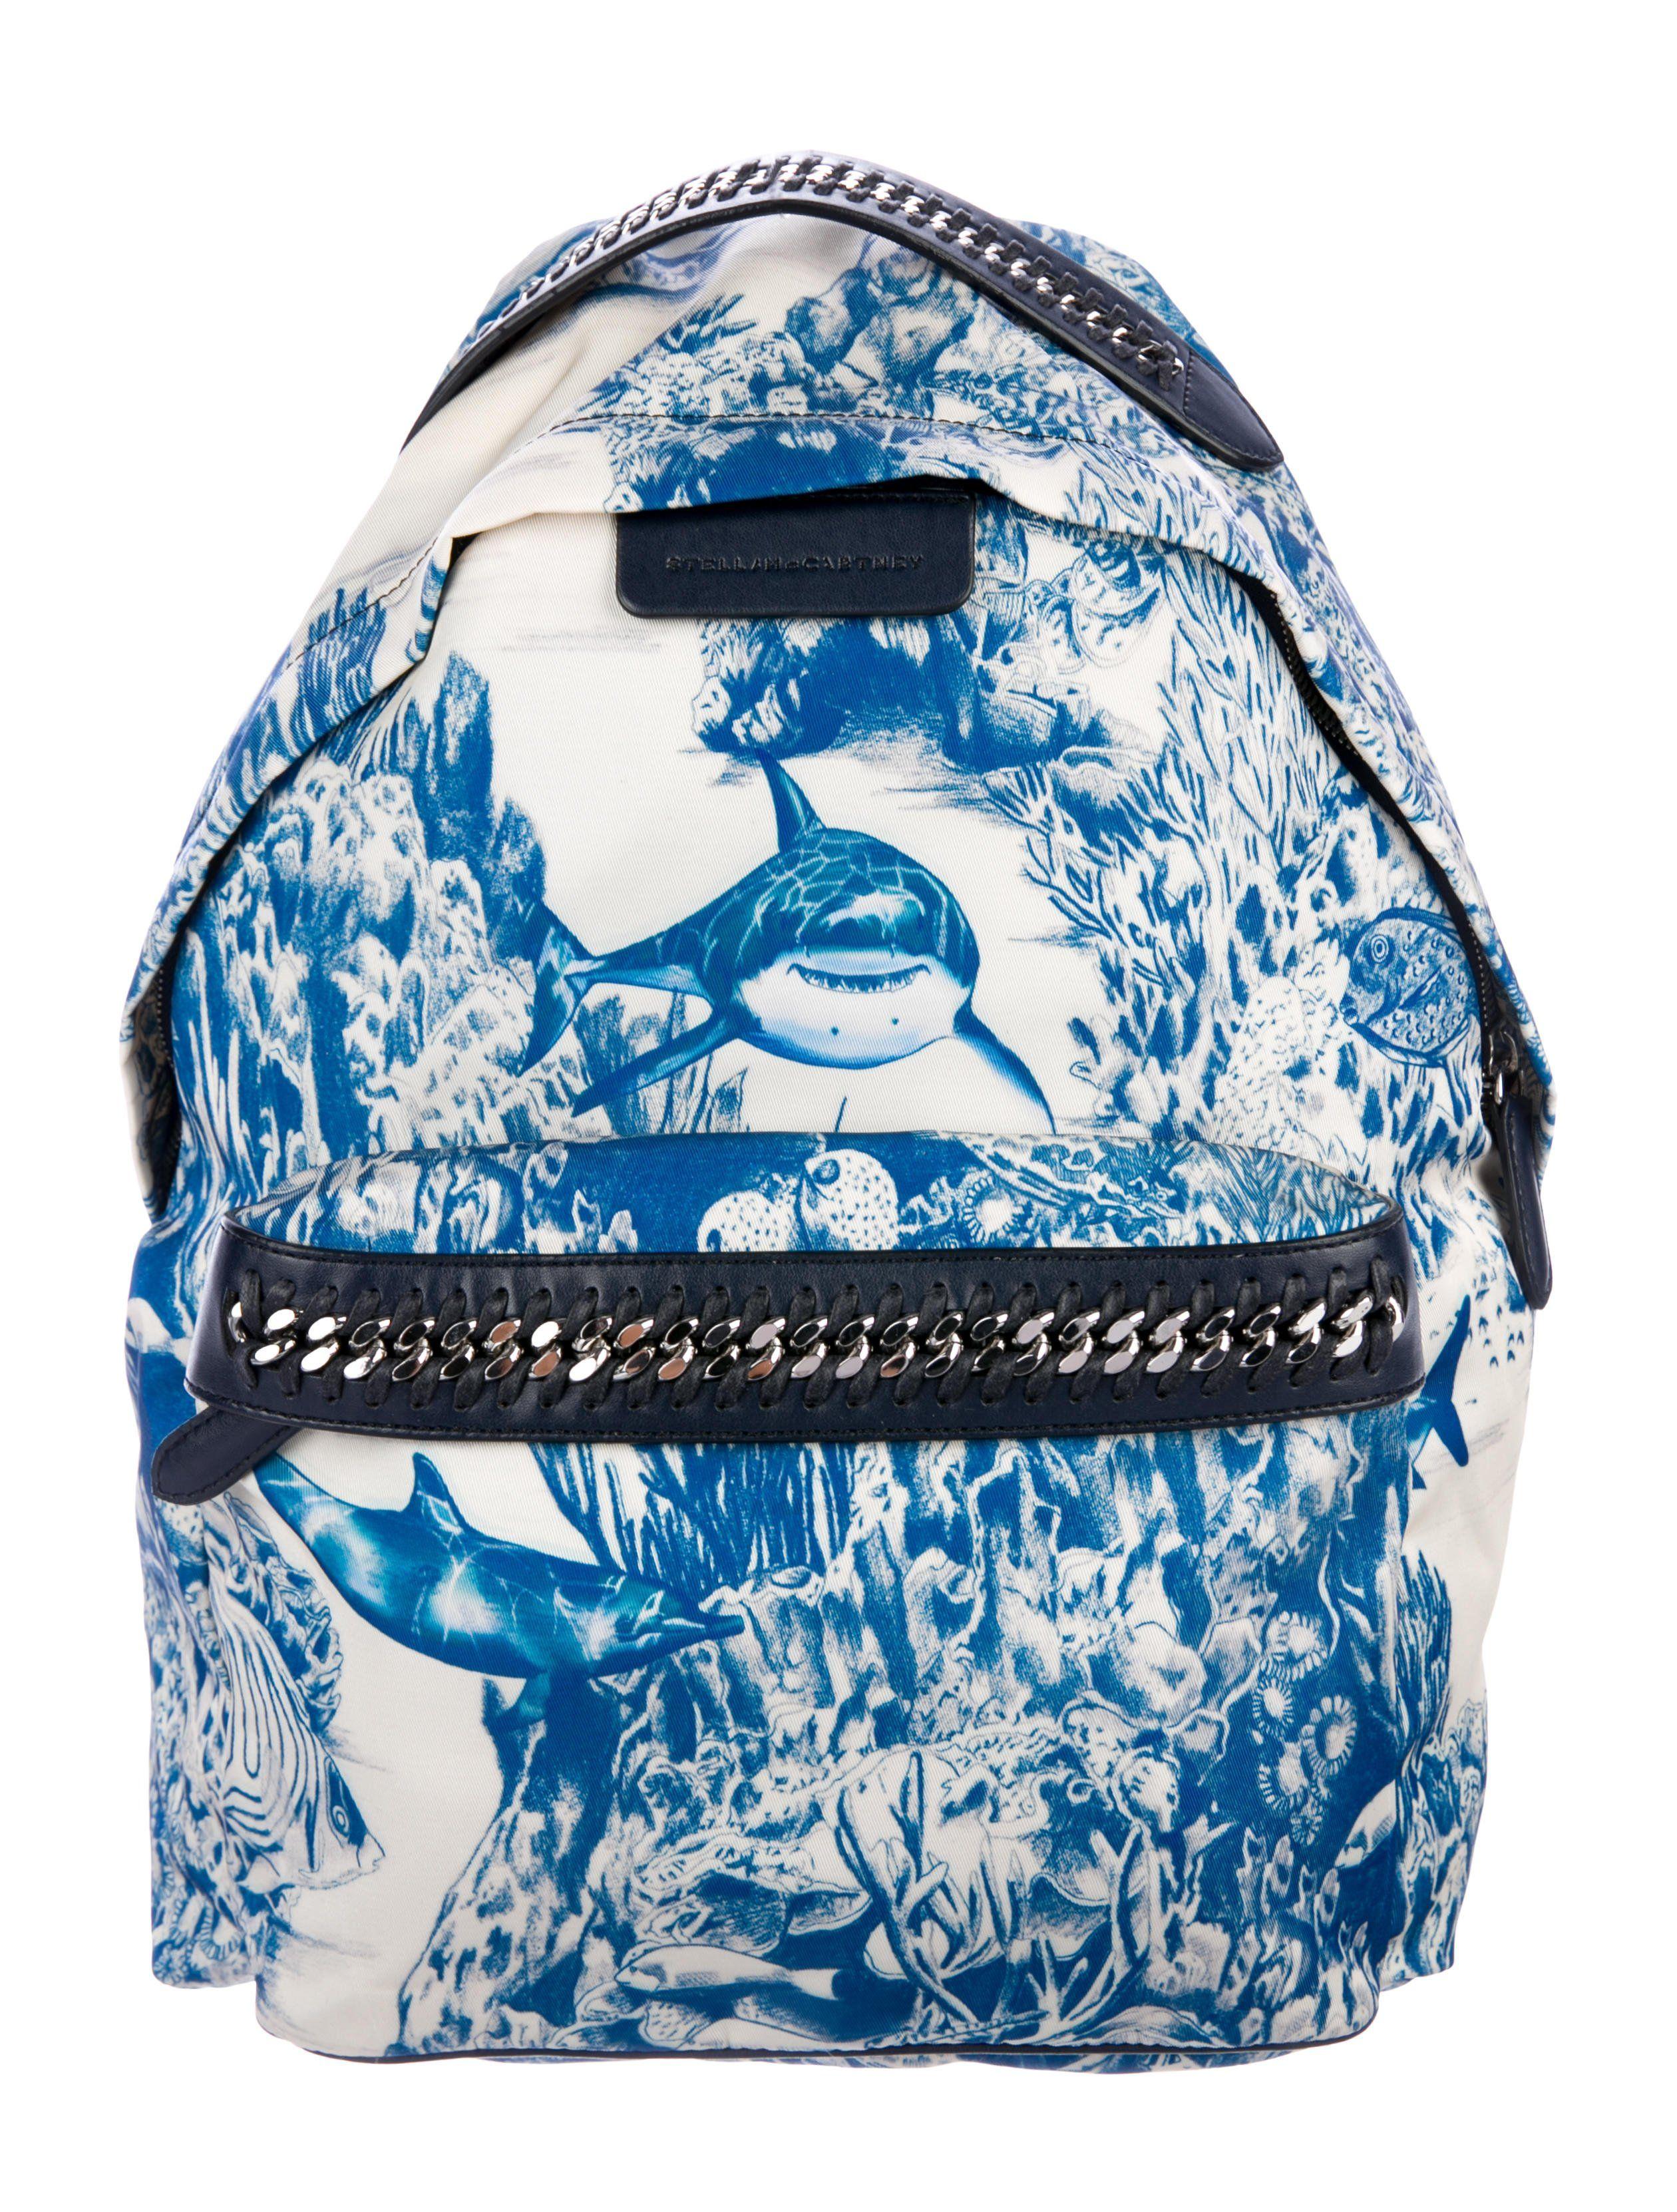 71686592af65 Creme and slate printed nylon Stella McCartney Falabella GO backpack with  ruthenium hardware